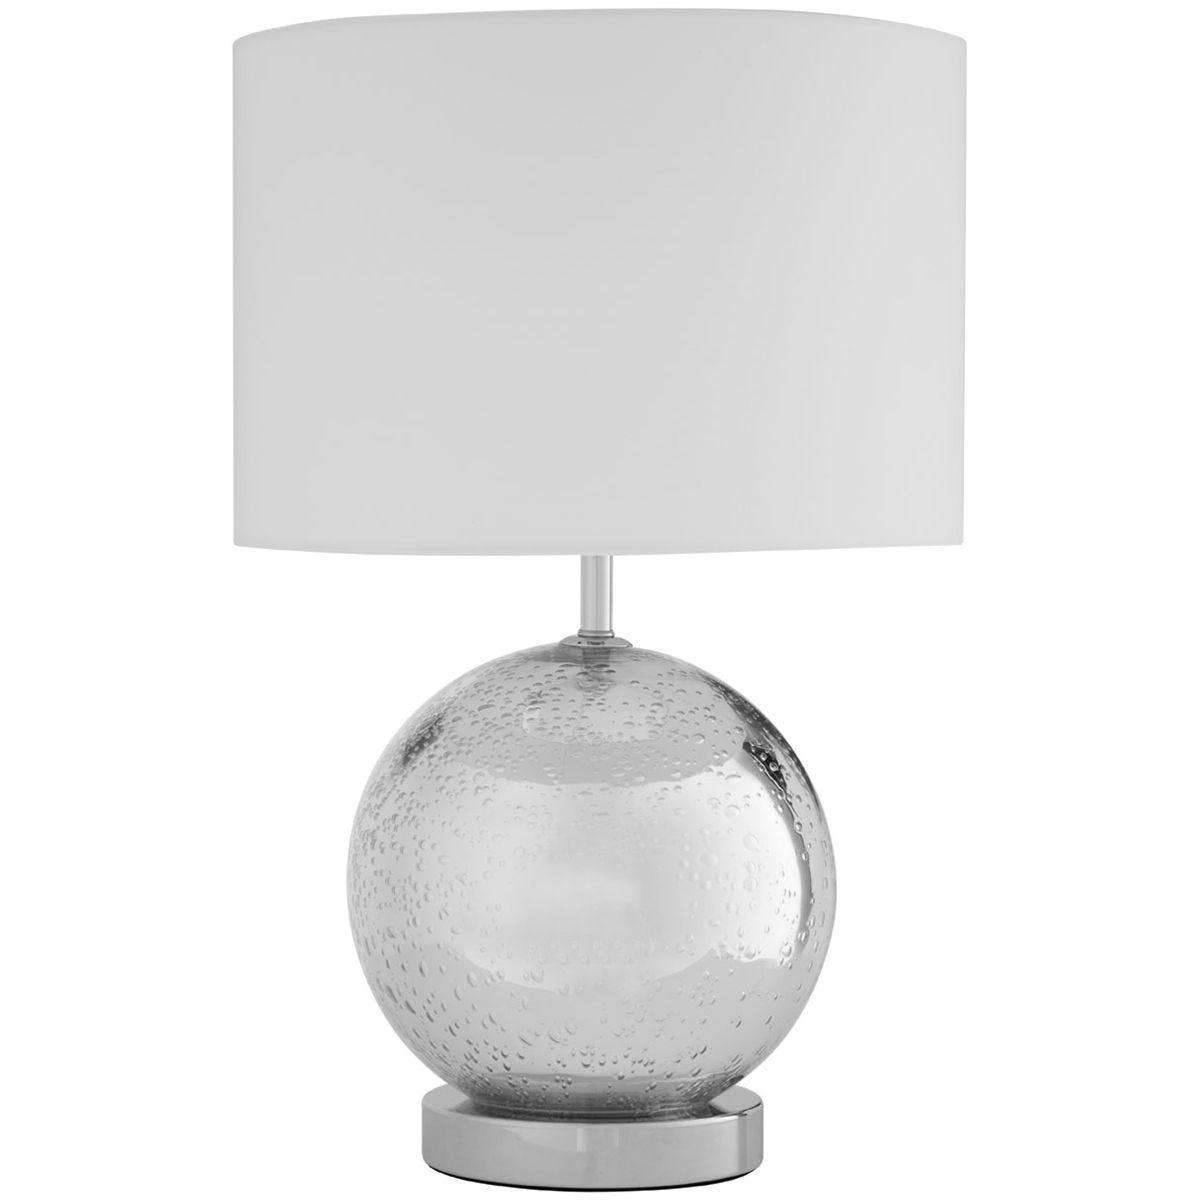 Naomi Table Lamp Glass / Chrome Fabric Shade / UK Plug